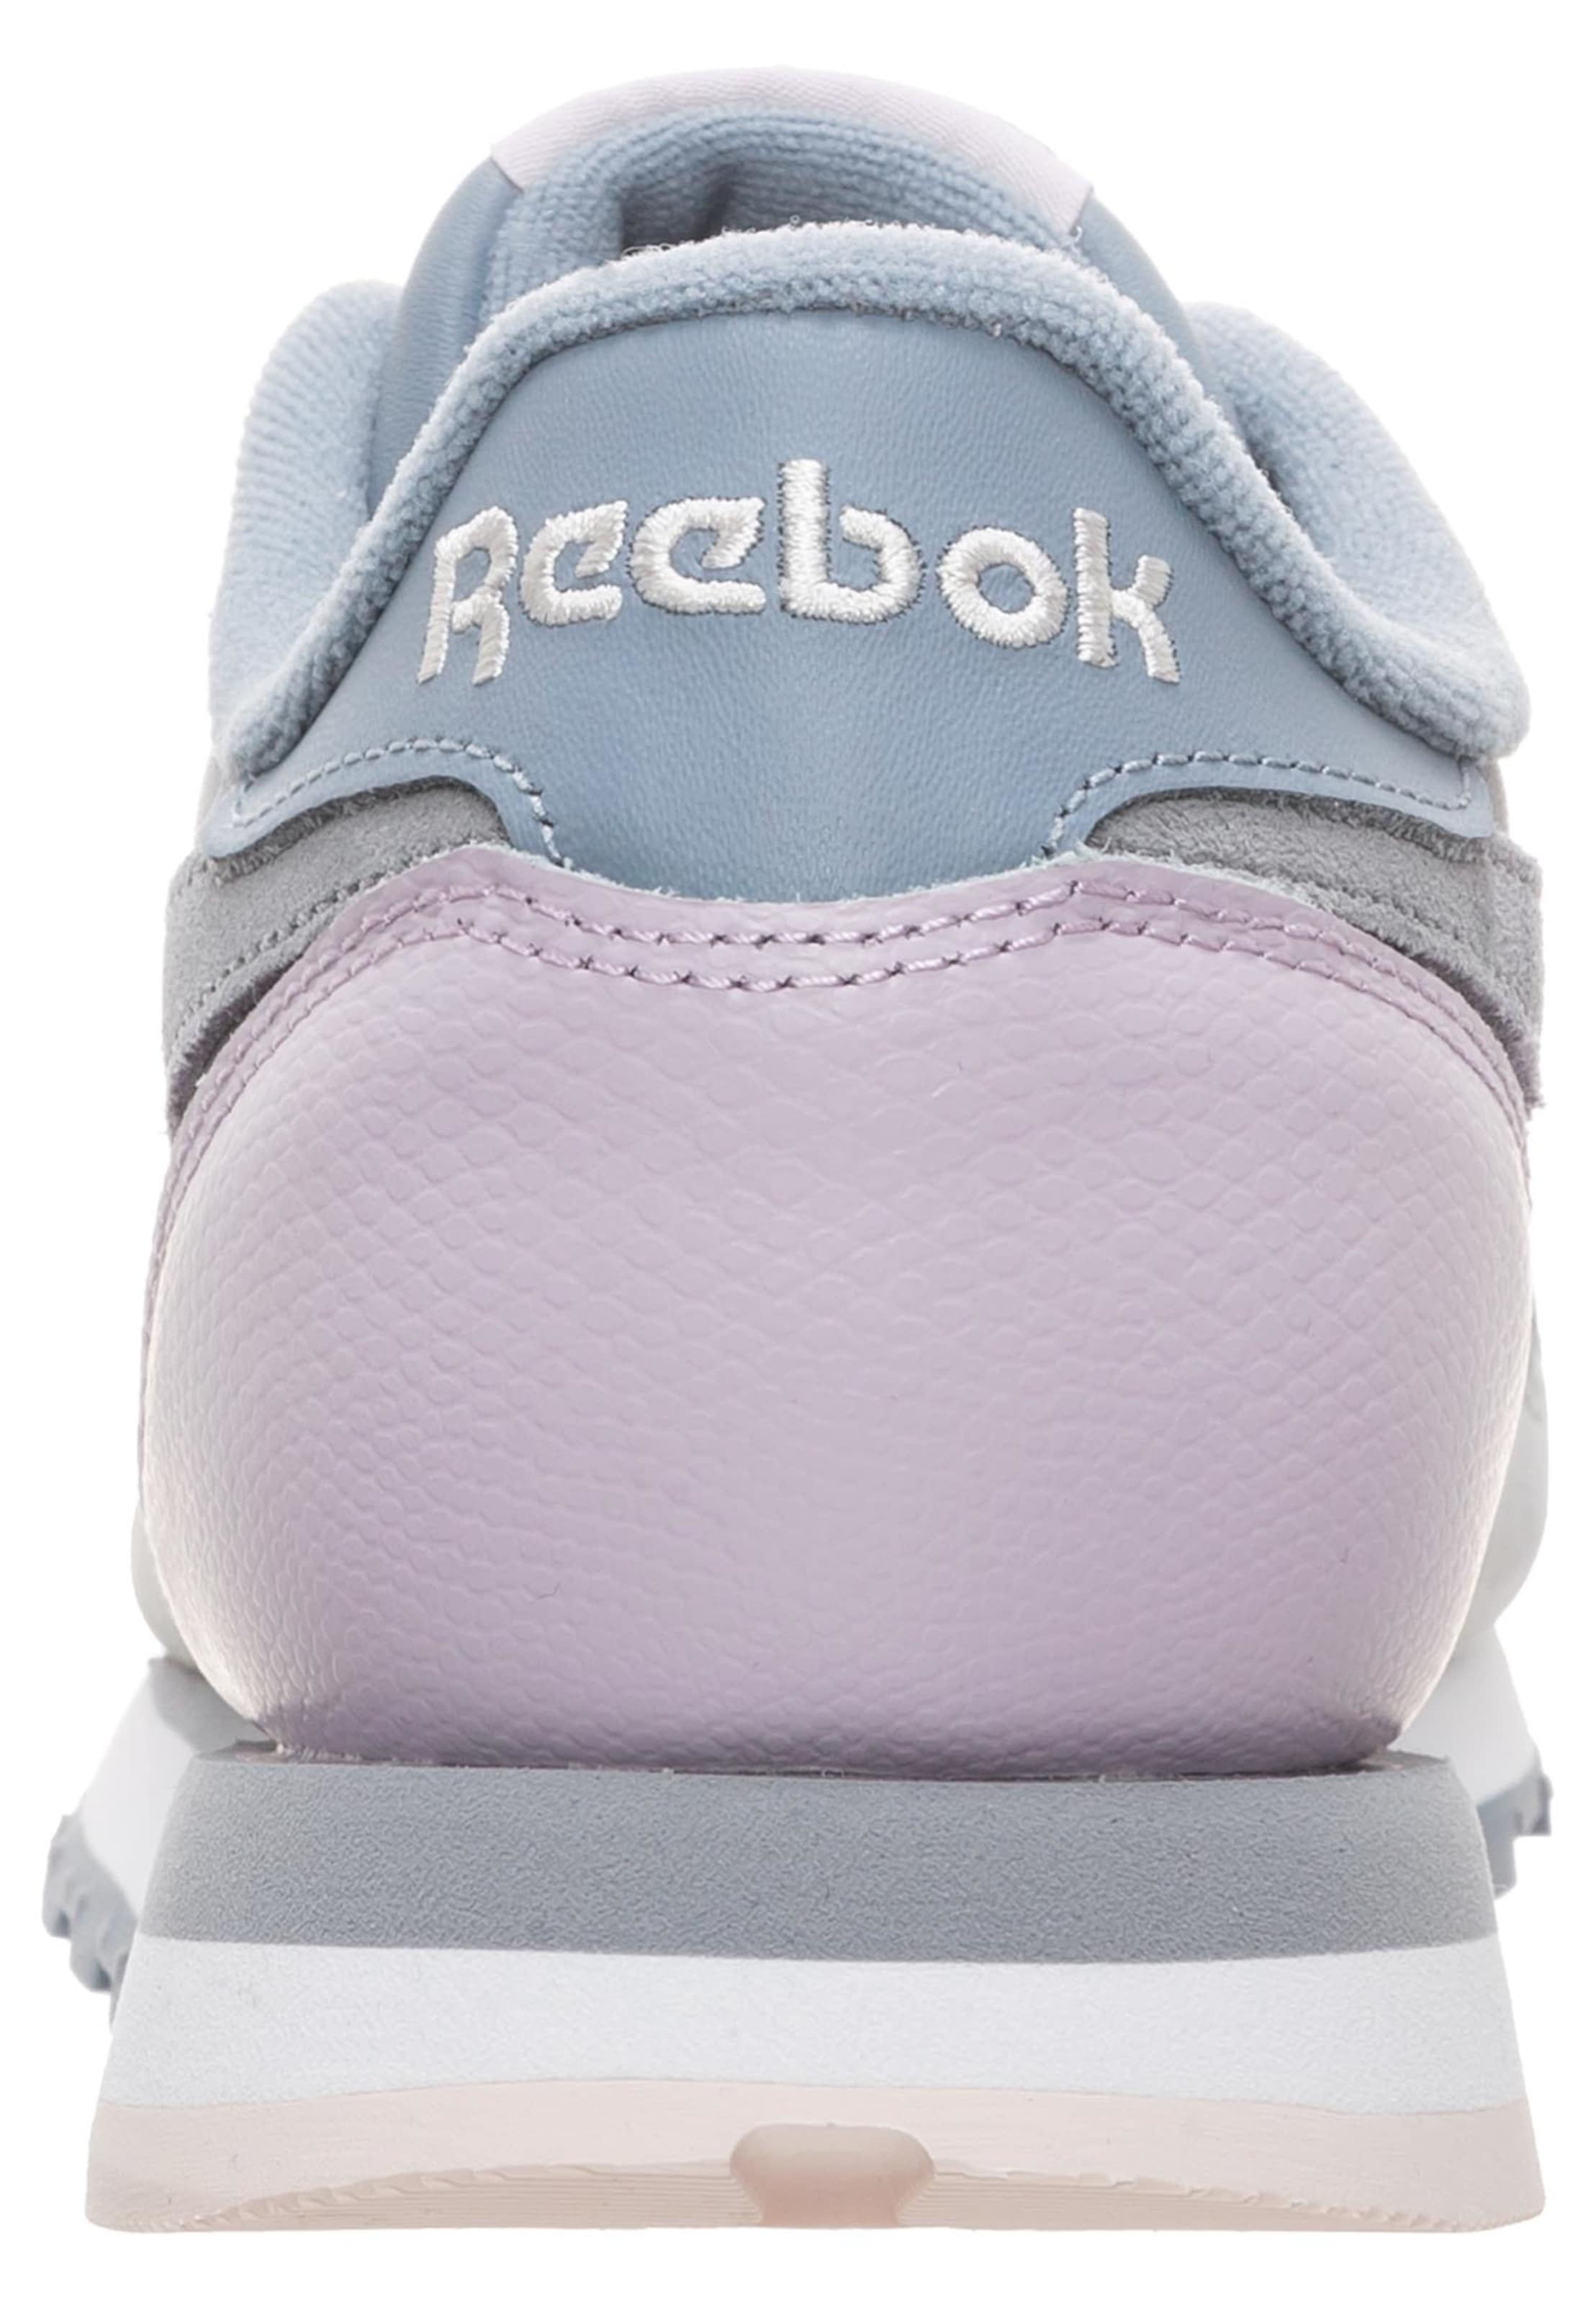 Rosa Hellgrau Sneaker In RauchblauGrau Reebok Classic 8wO0kXnP